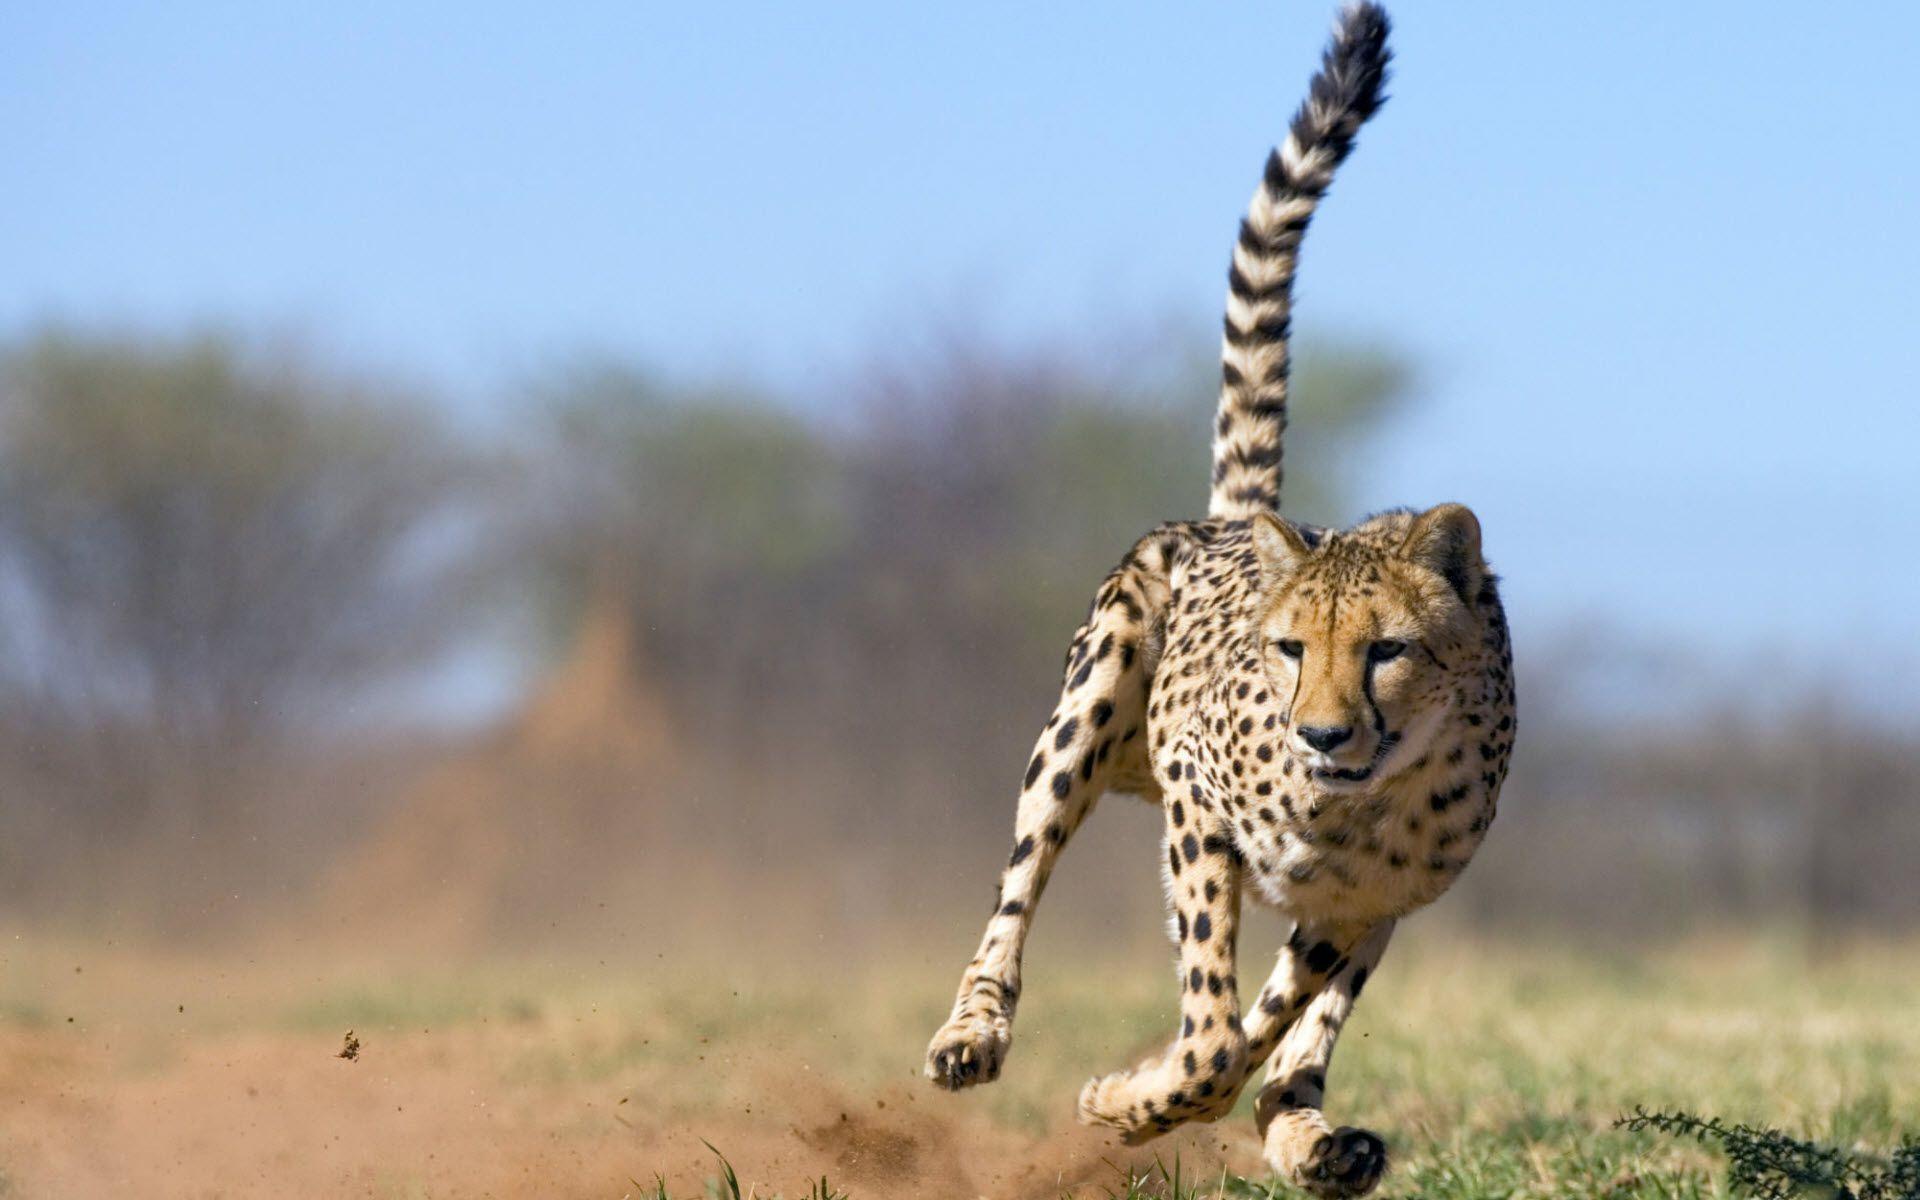 Res: 1920x1200, Cheetah | Wallpapers HD free Download